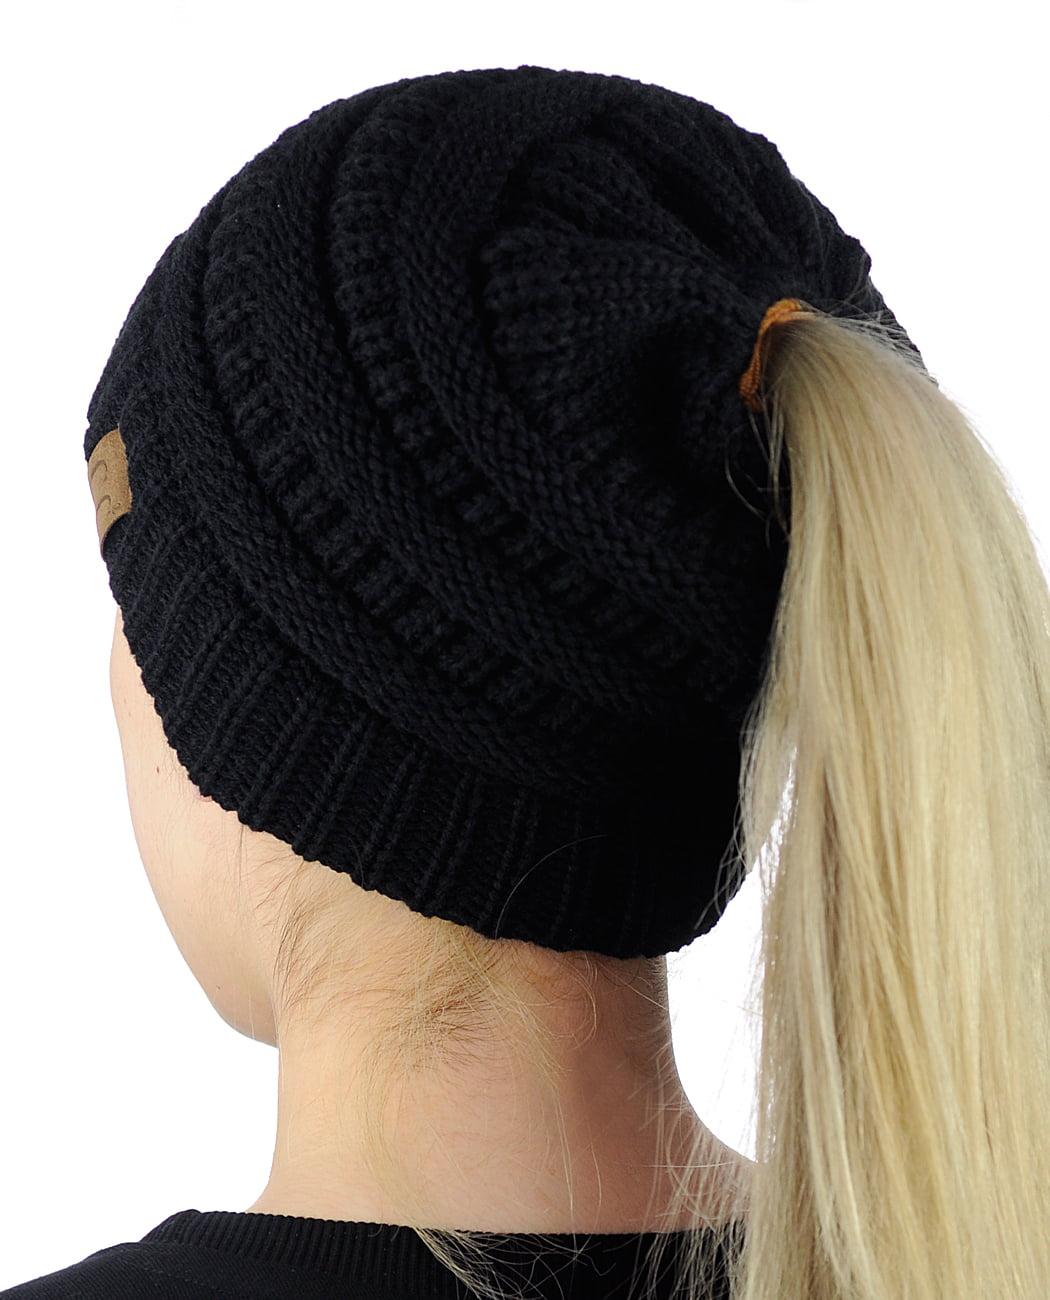 discount c.c beanietail soft stretch cable knit messy high bun ponytail beanie  hat black c1907 48b62 5178c7de8fdc